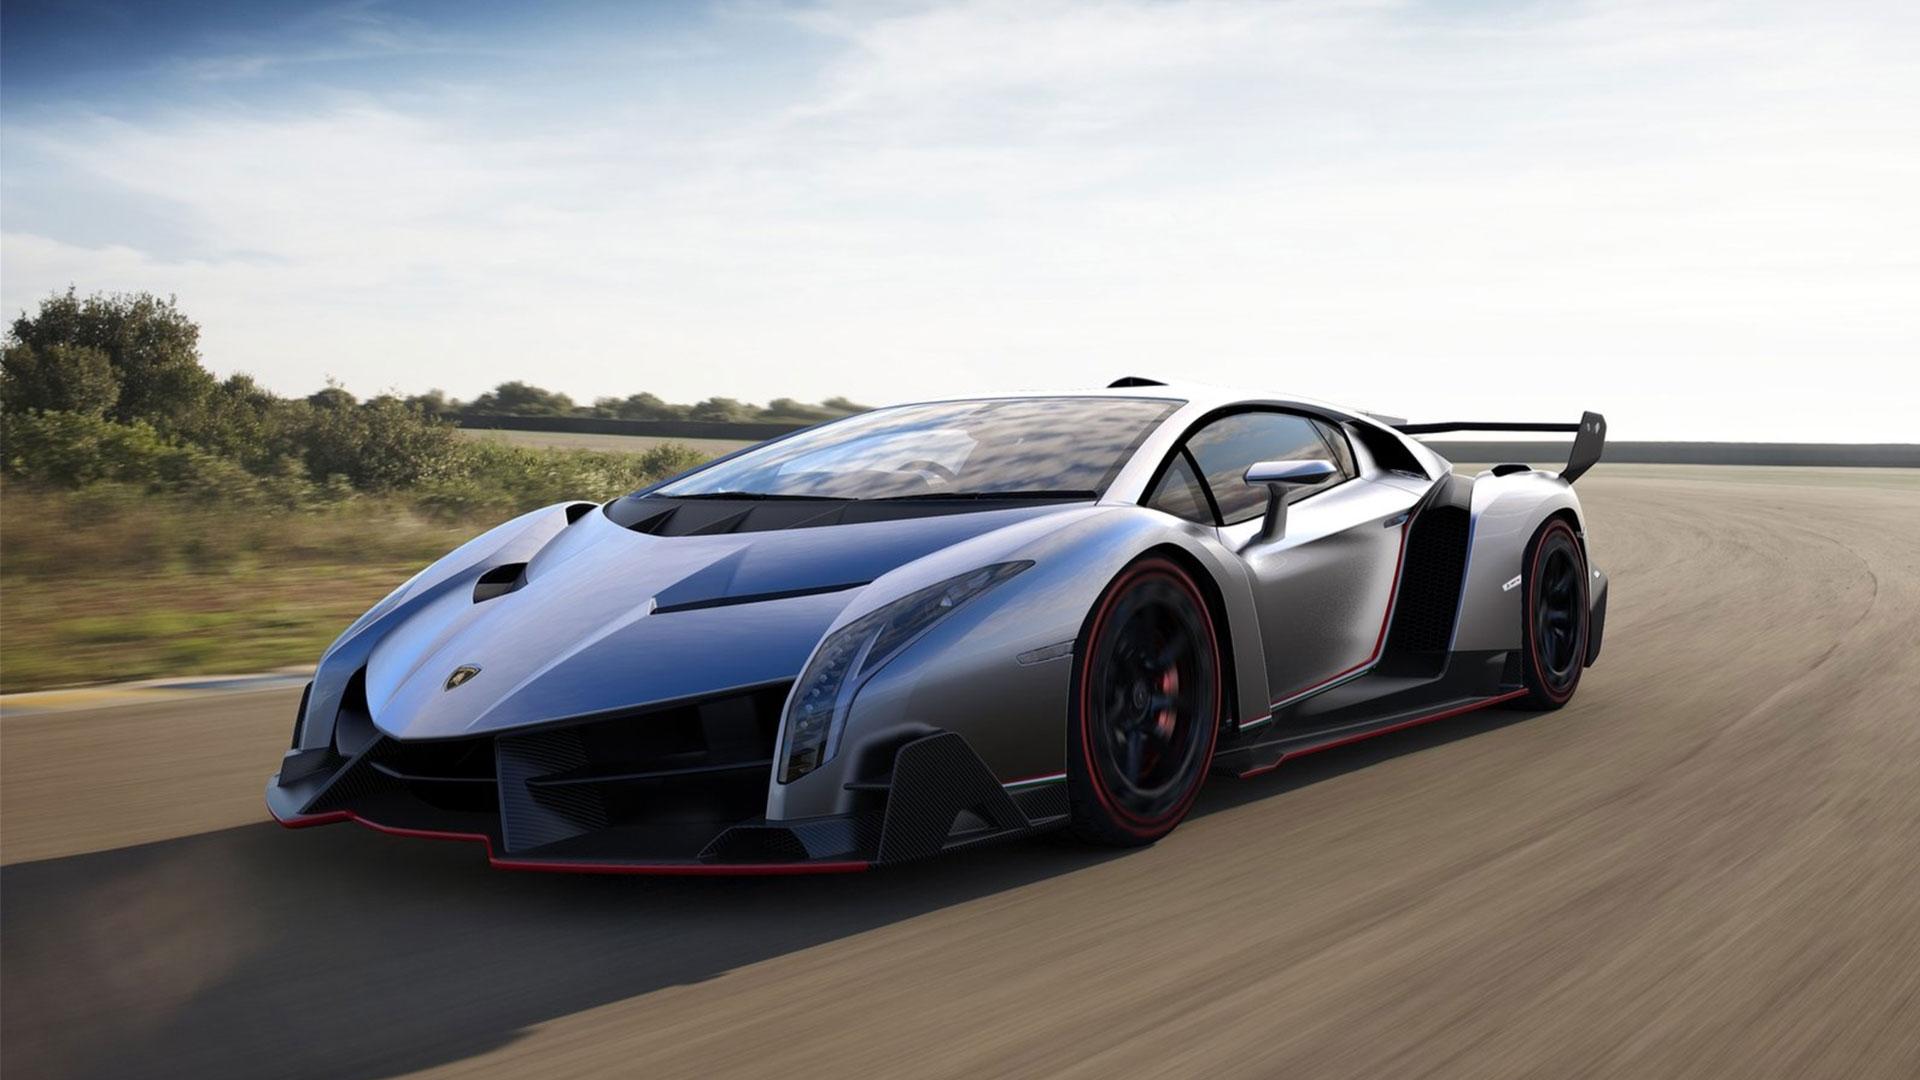 Lamborghini-Egoista-HD-×-pxbux-Free-jpeg-1920×1080-wallpaper-wp3407959